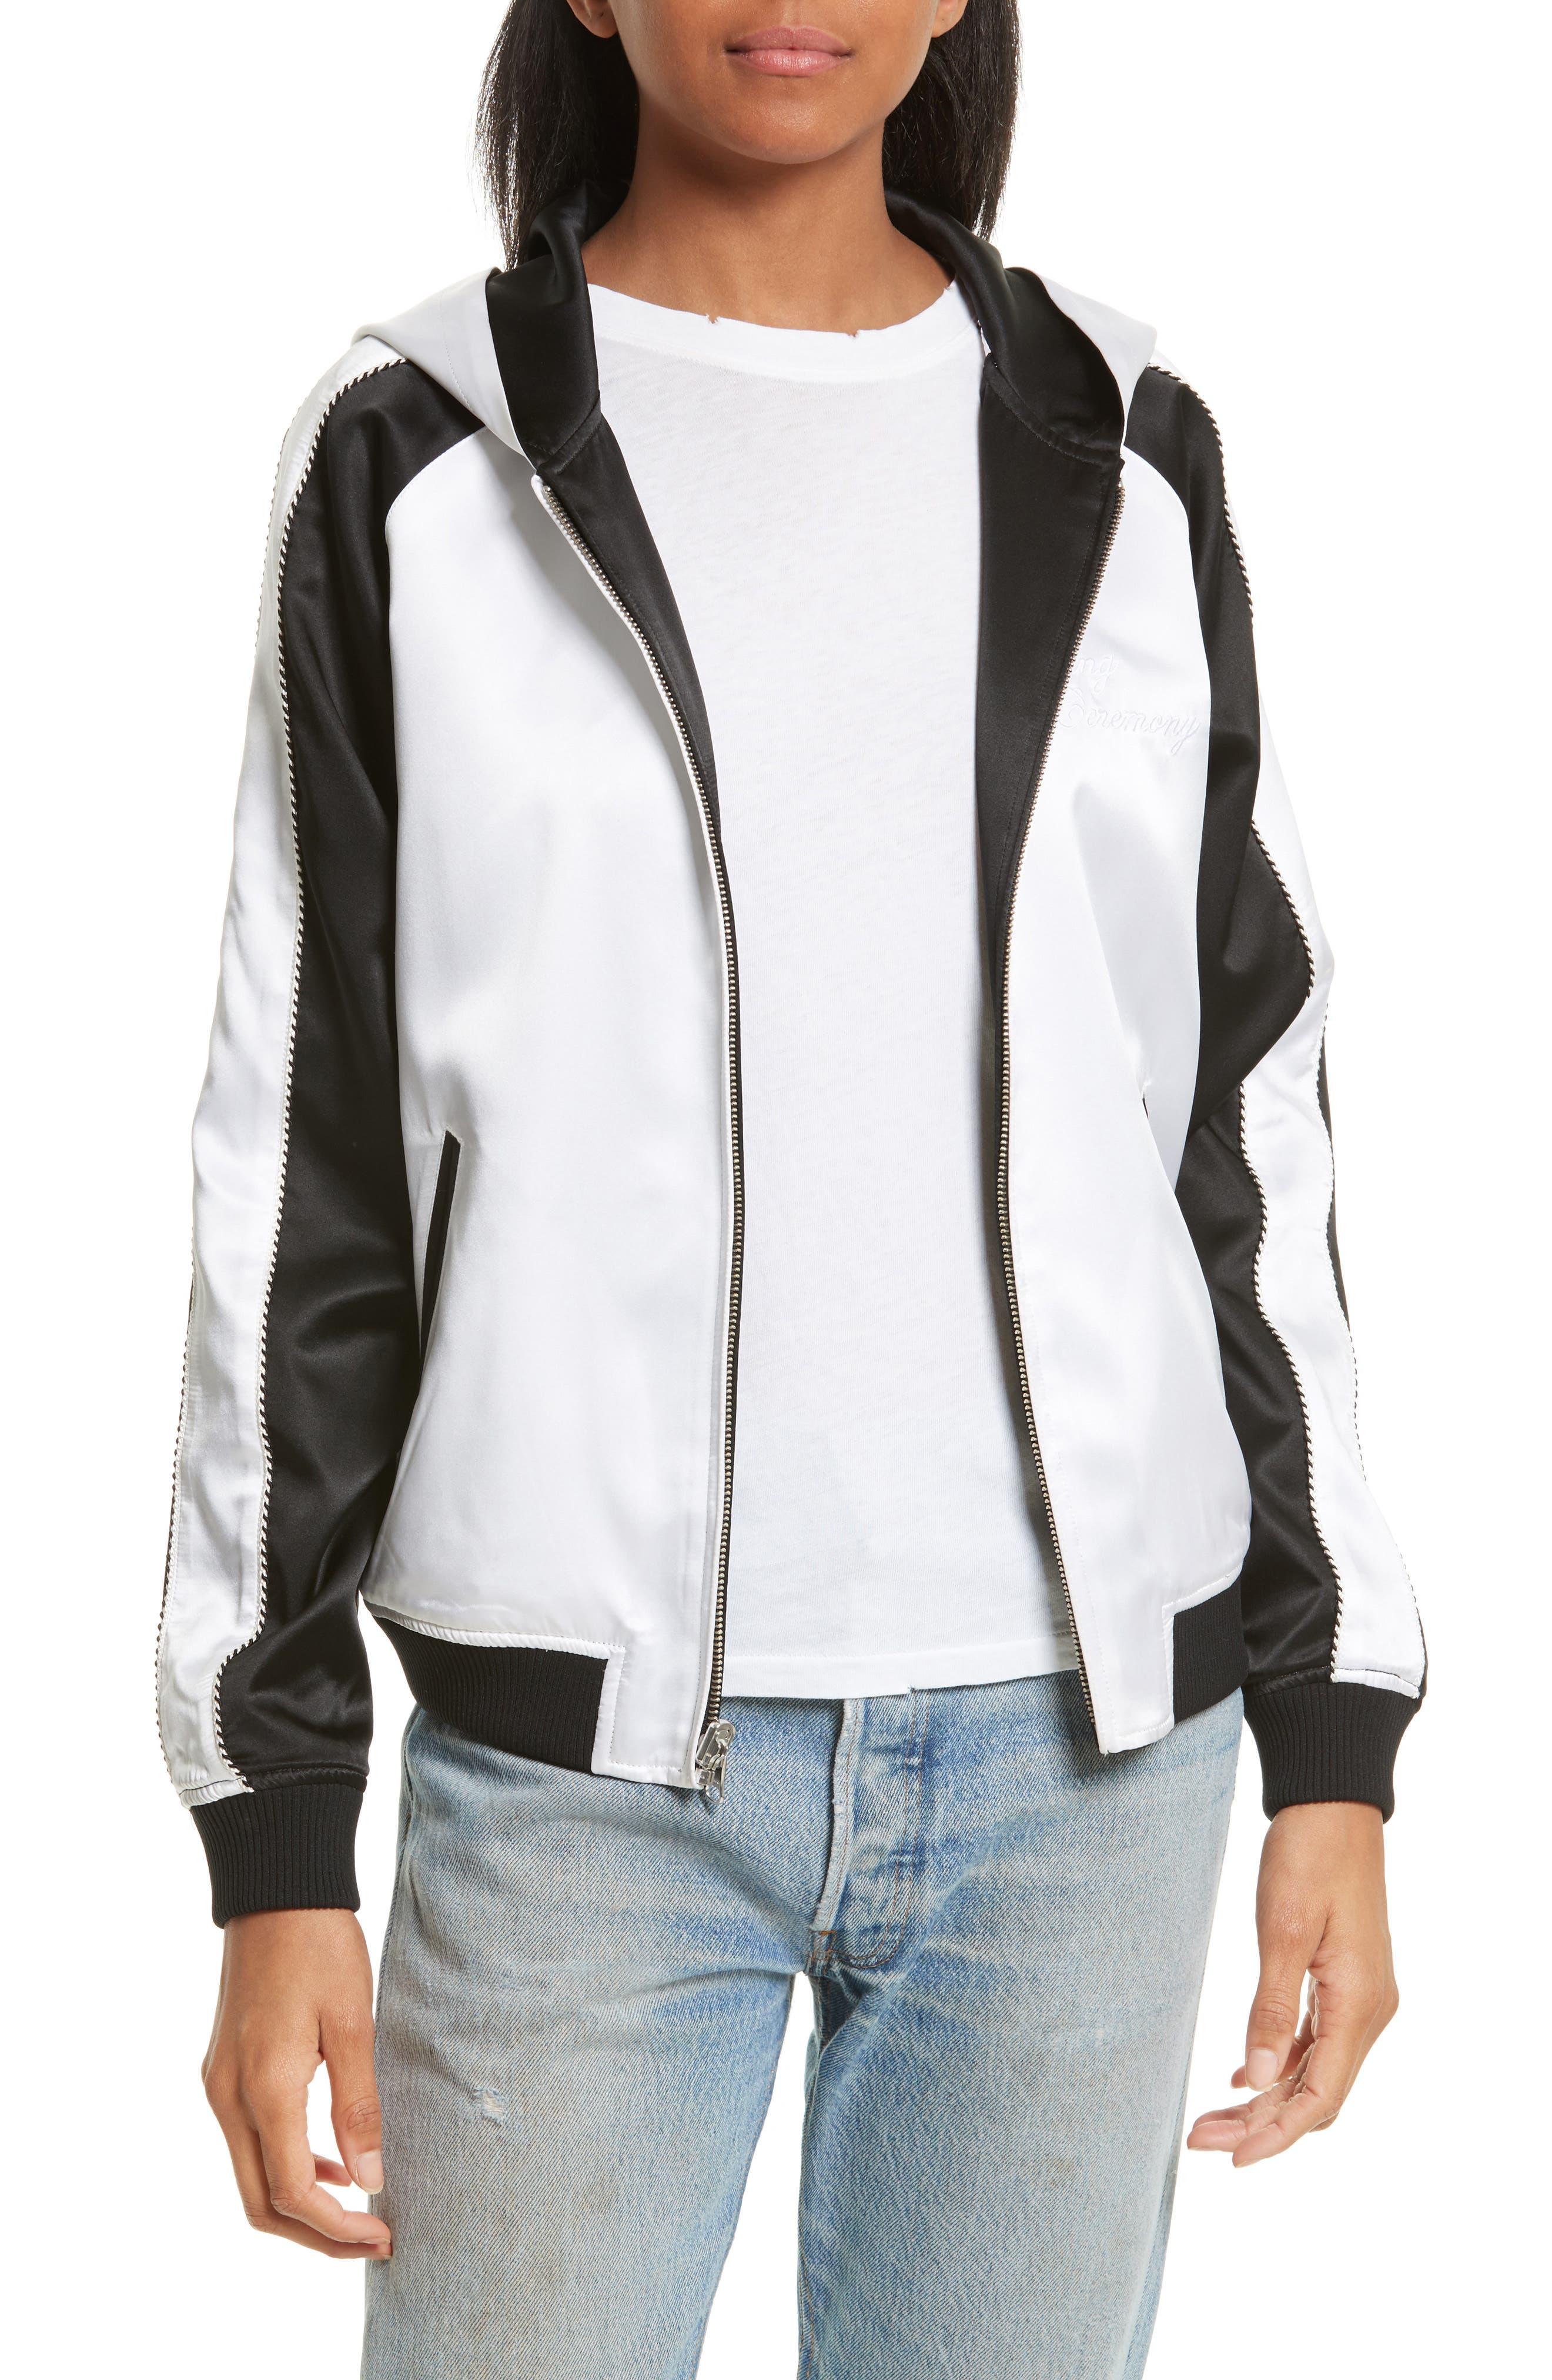 OC Reversible Silk Track Jacket,                             Main thumbnail 1, color,                             002